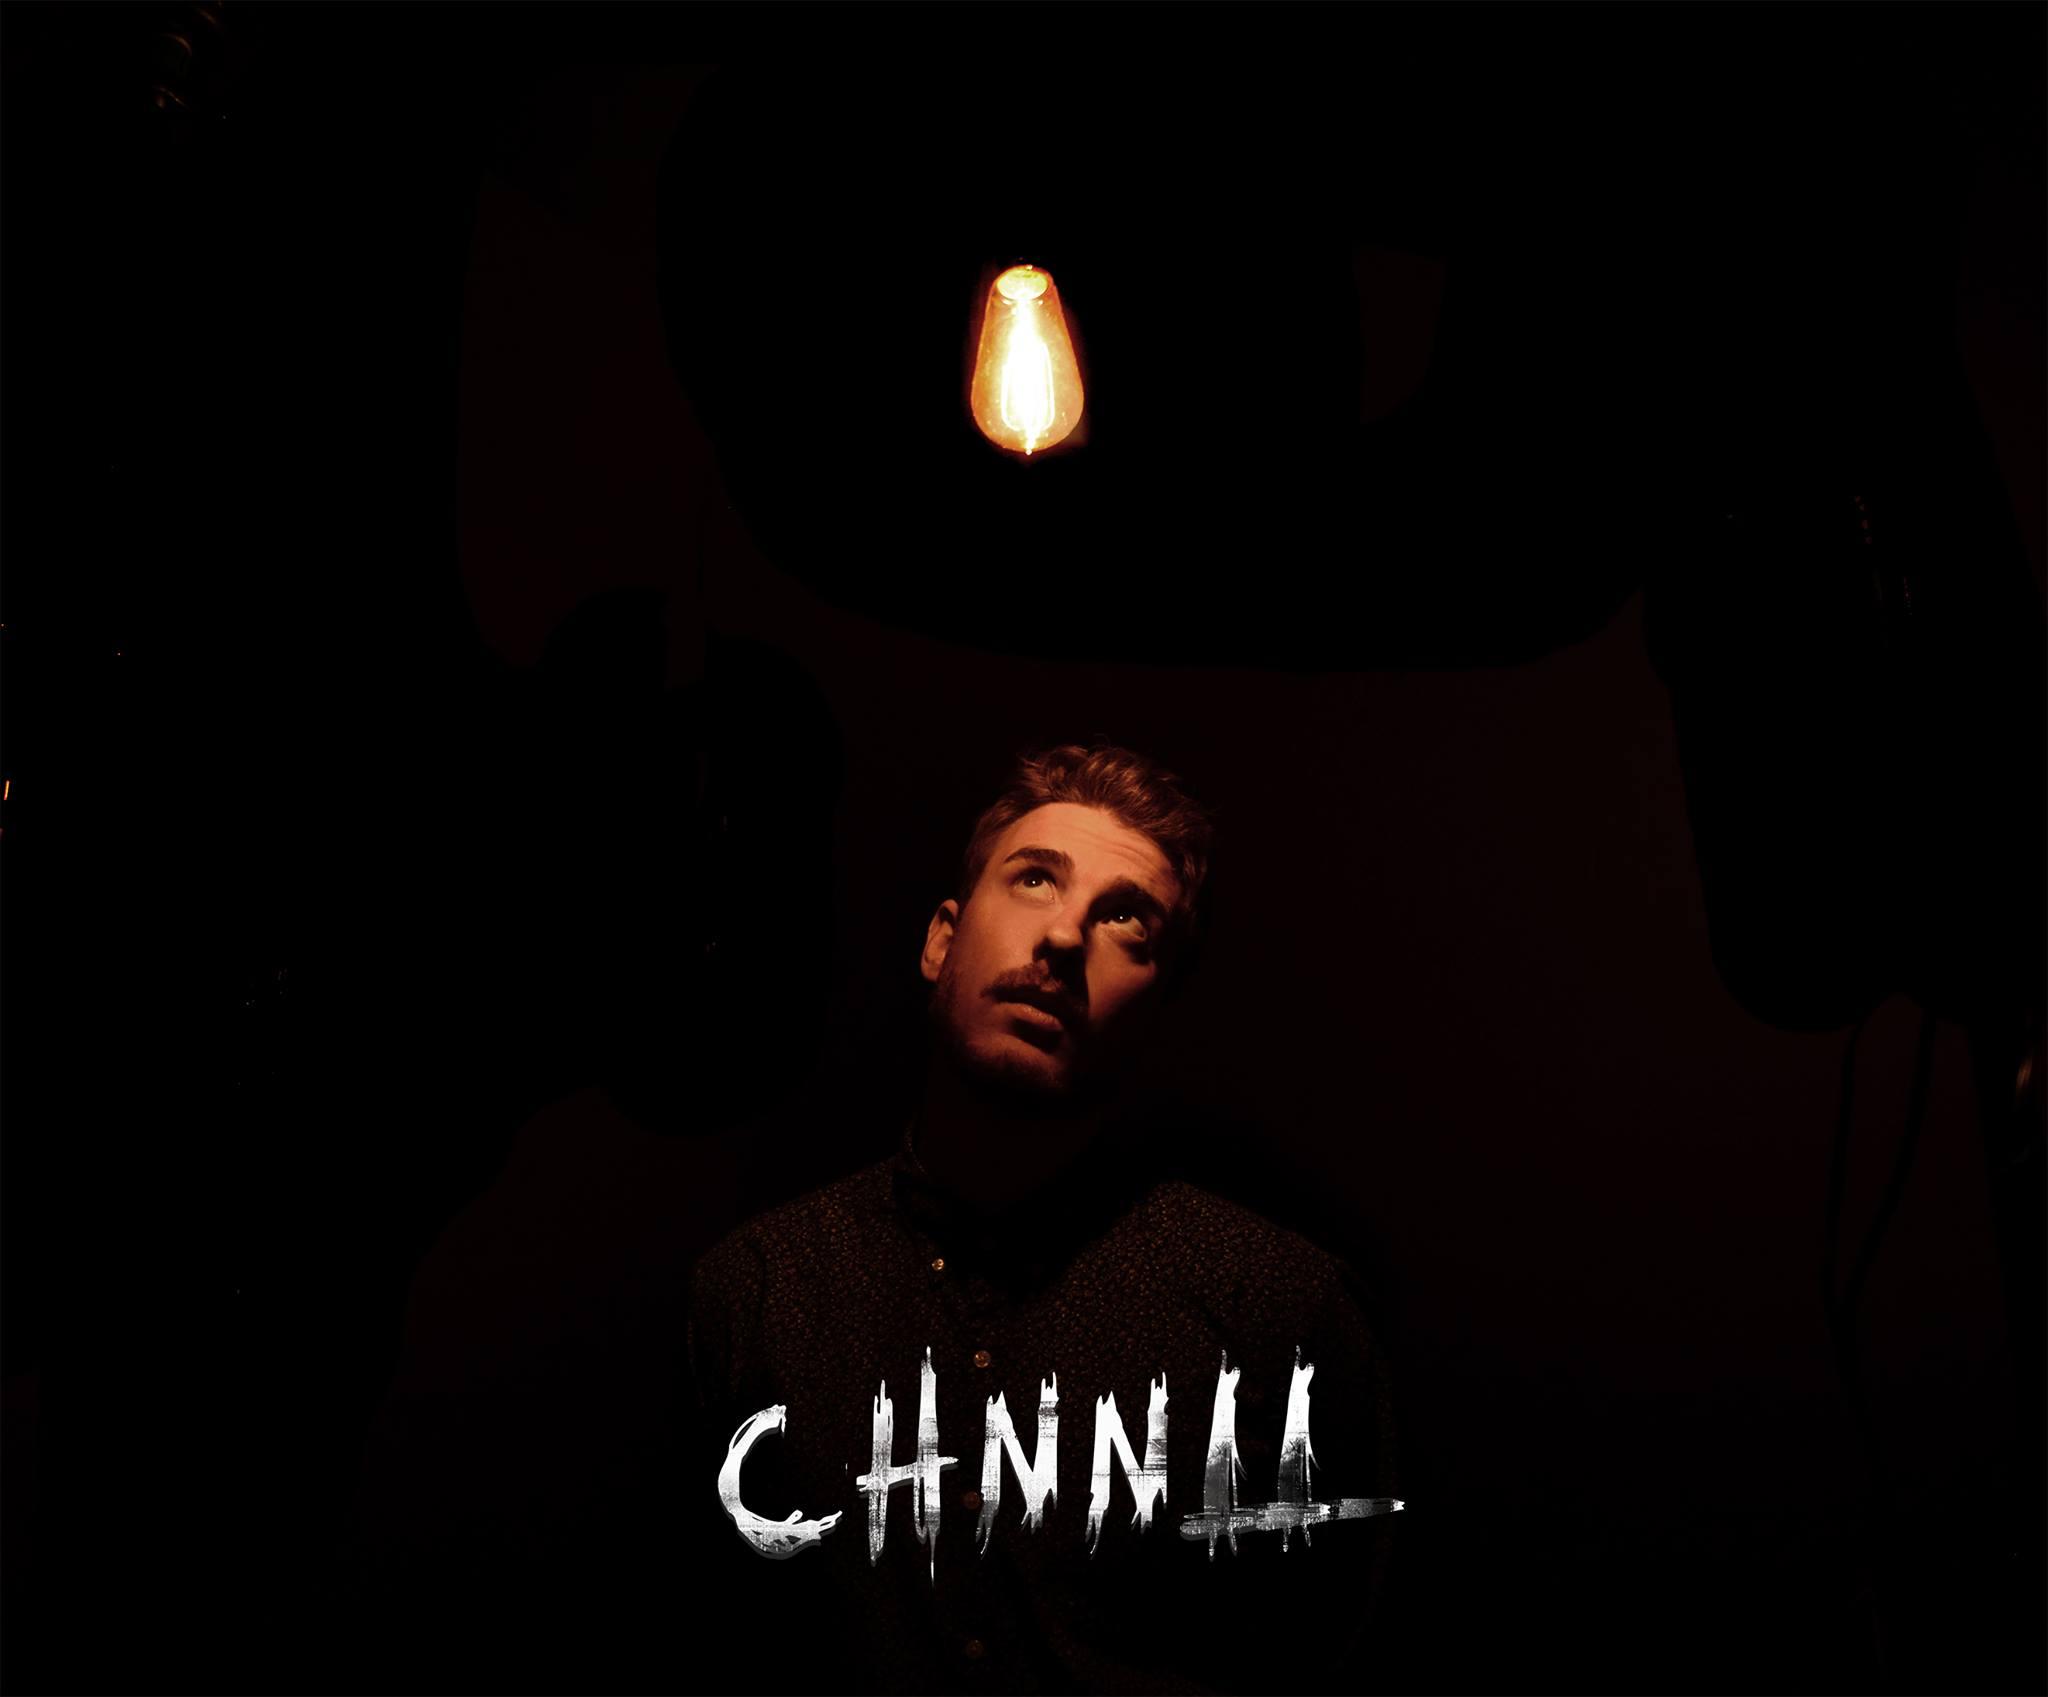 CHNNLL - Composer, Multi-instrumentalist, Producer